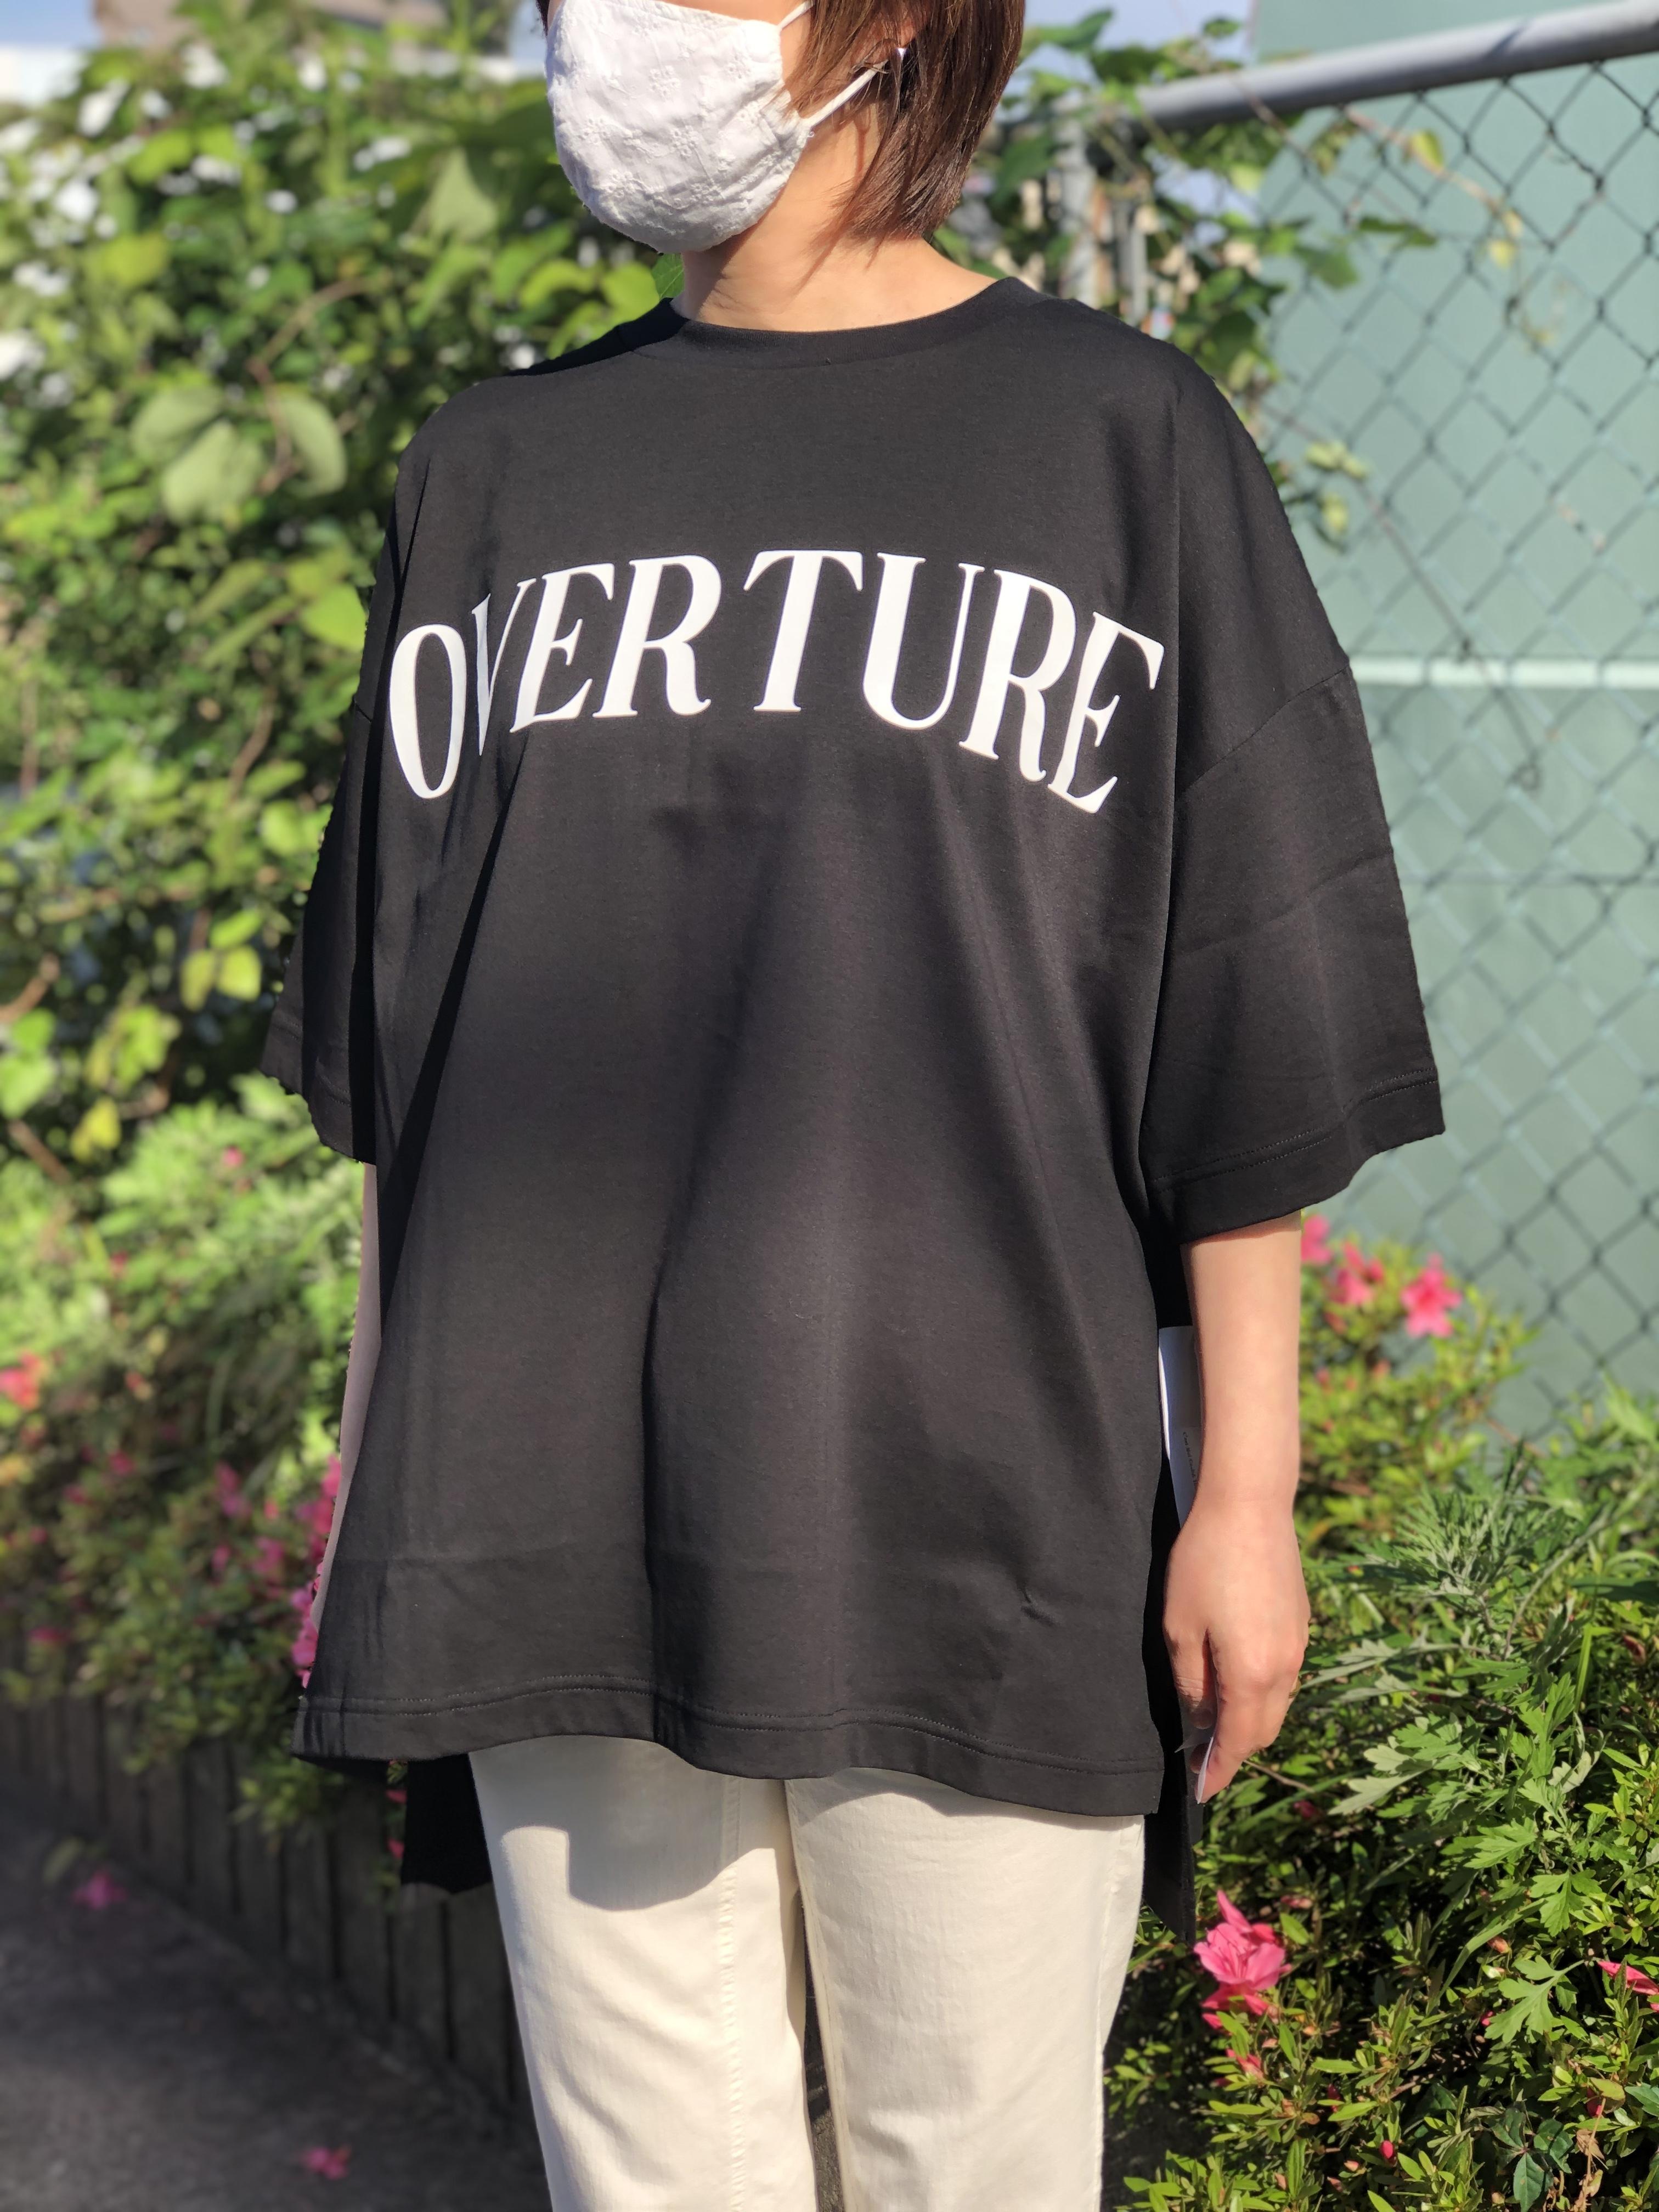 Dignite Collier/802320/ワイドTシャツ(ブラック)